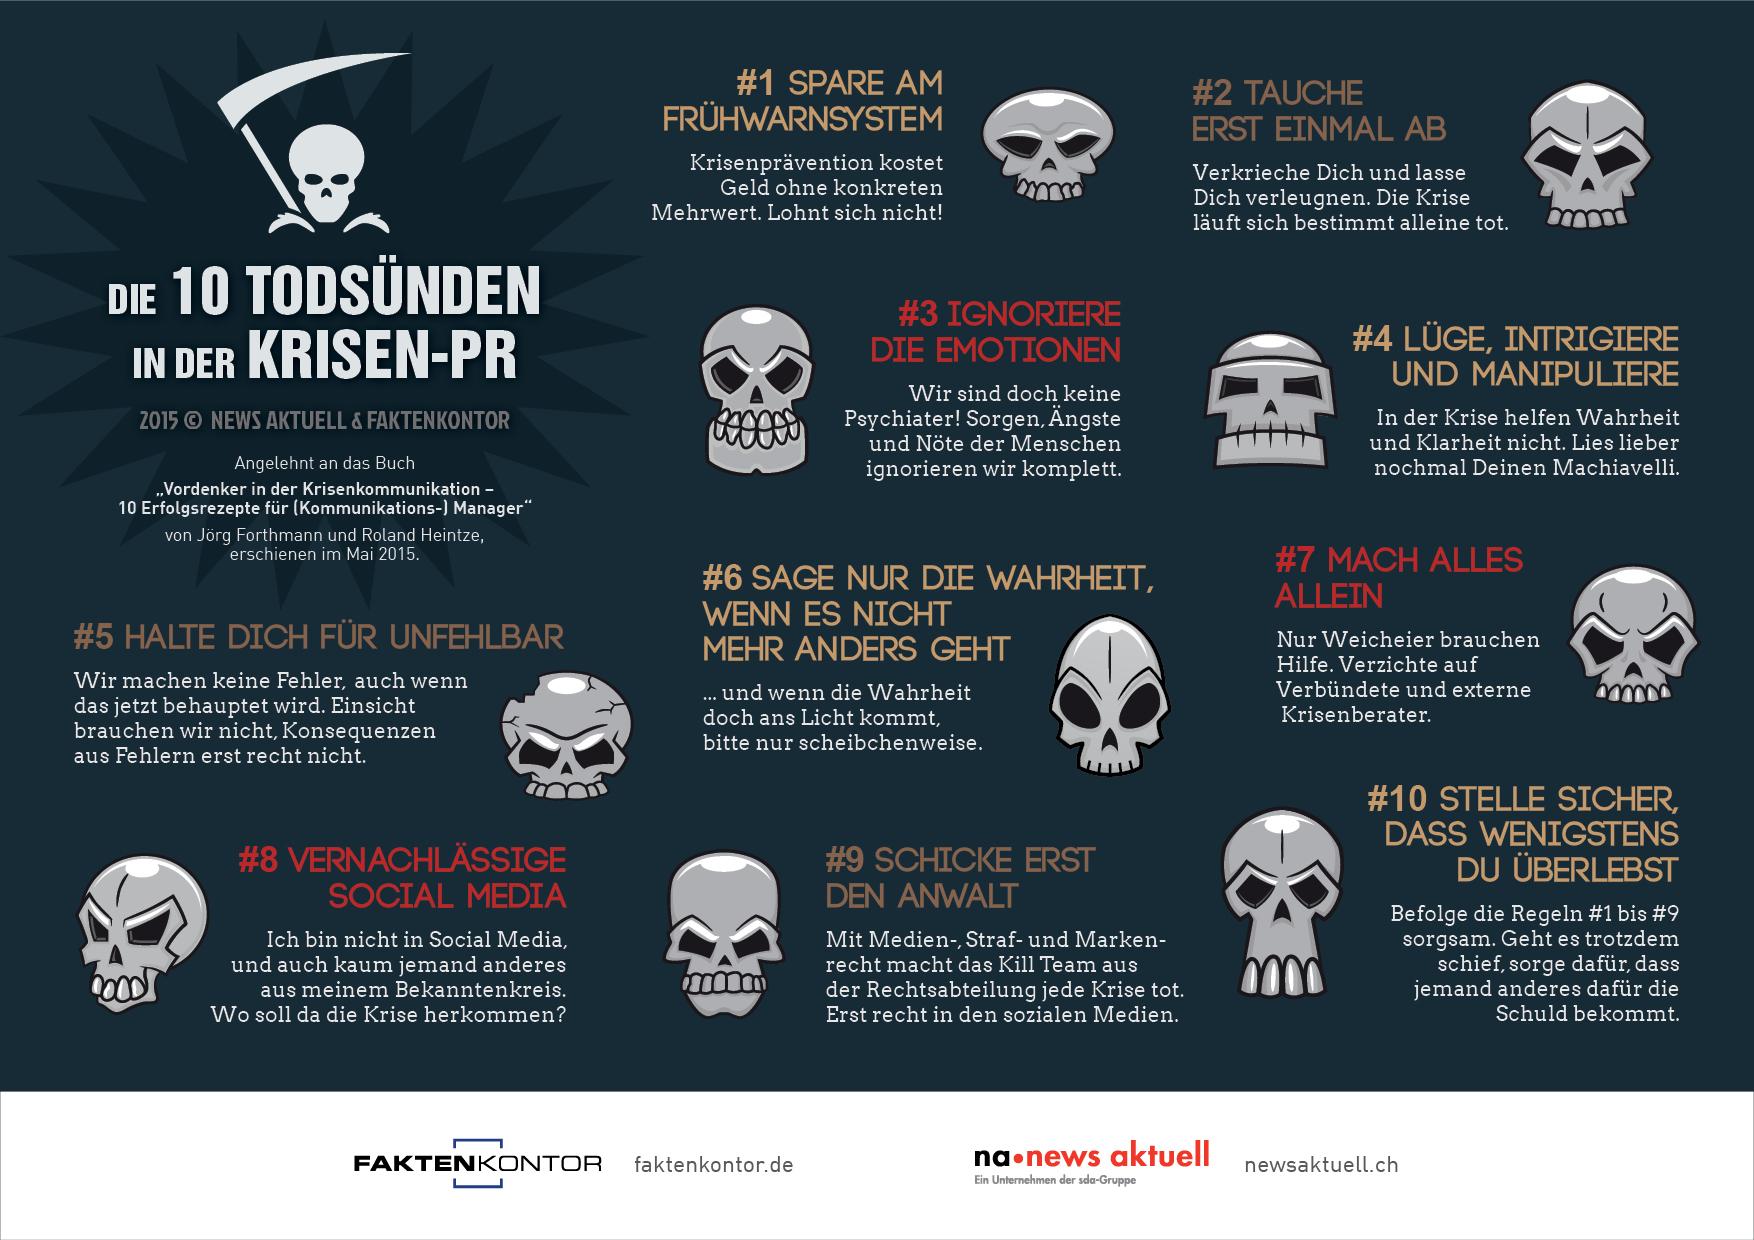 Shitstorm, Krisen-PR, diagonal, marketingagentur.ch